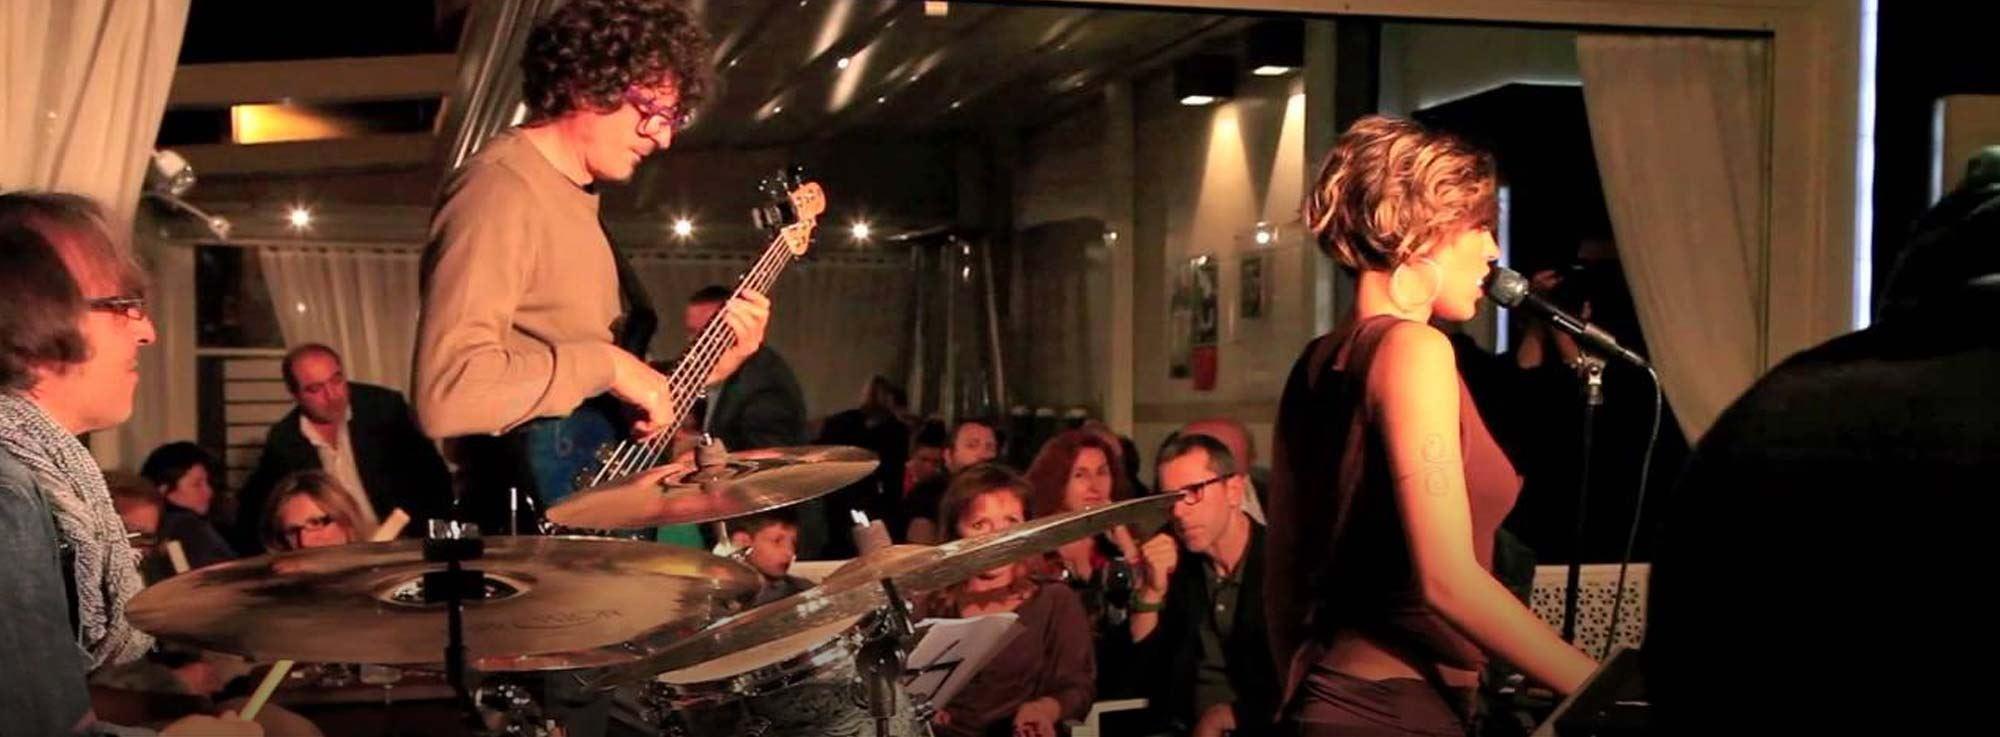 Trani: Serena Brancale Quartet live